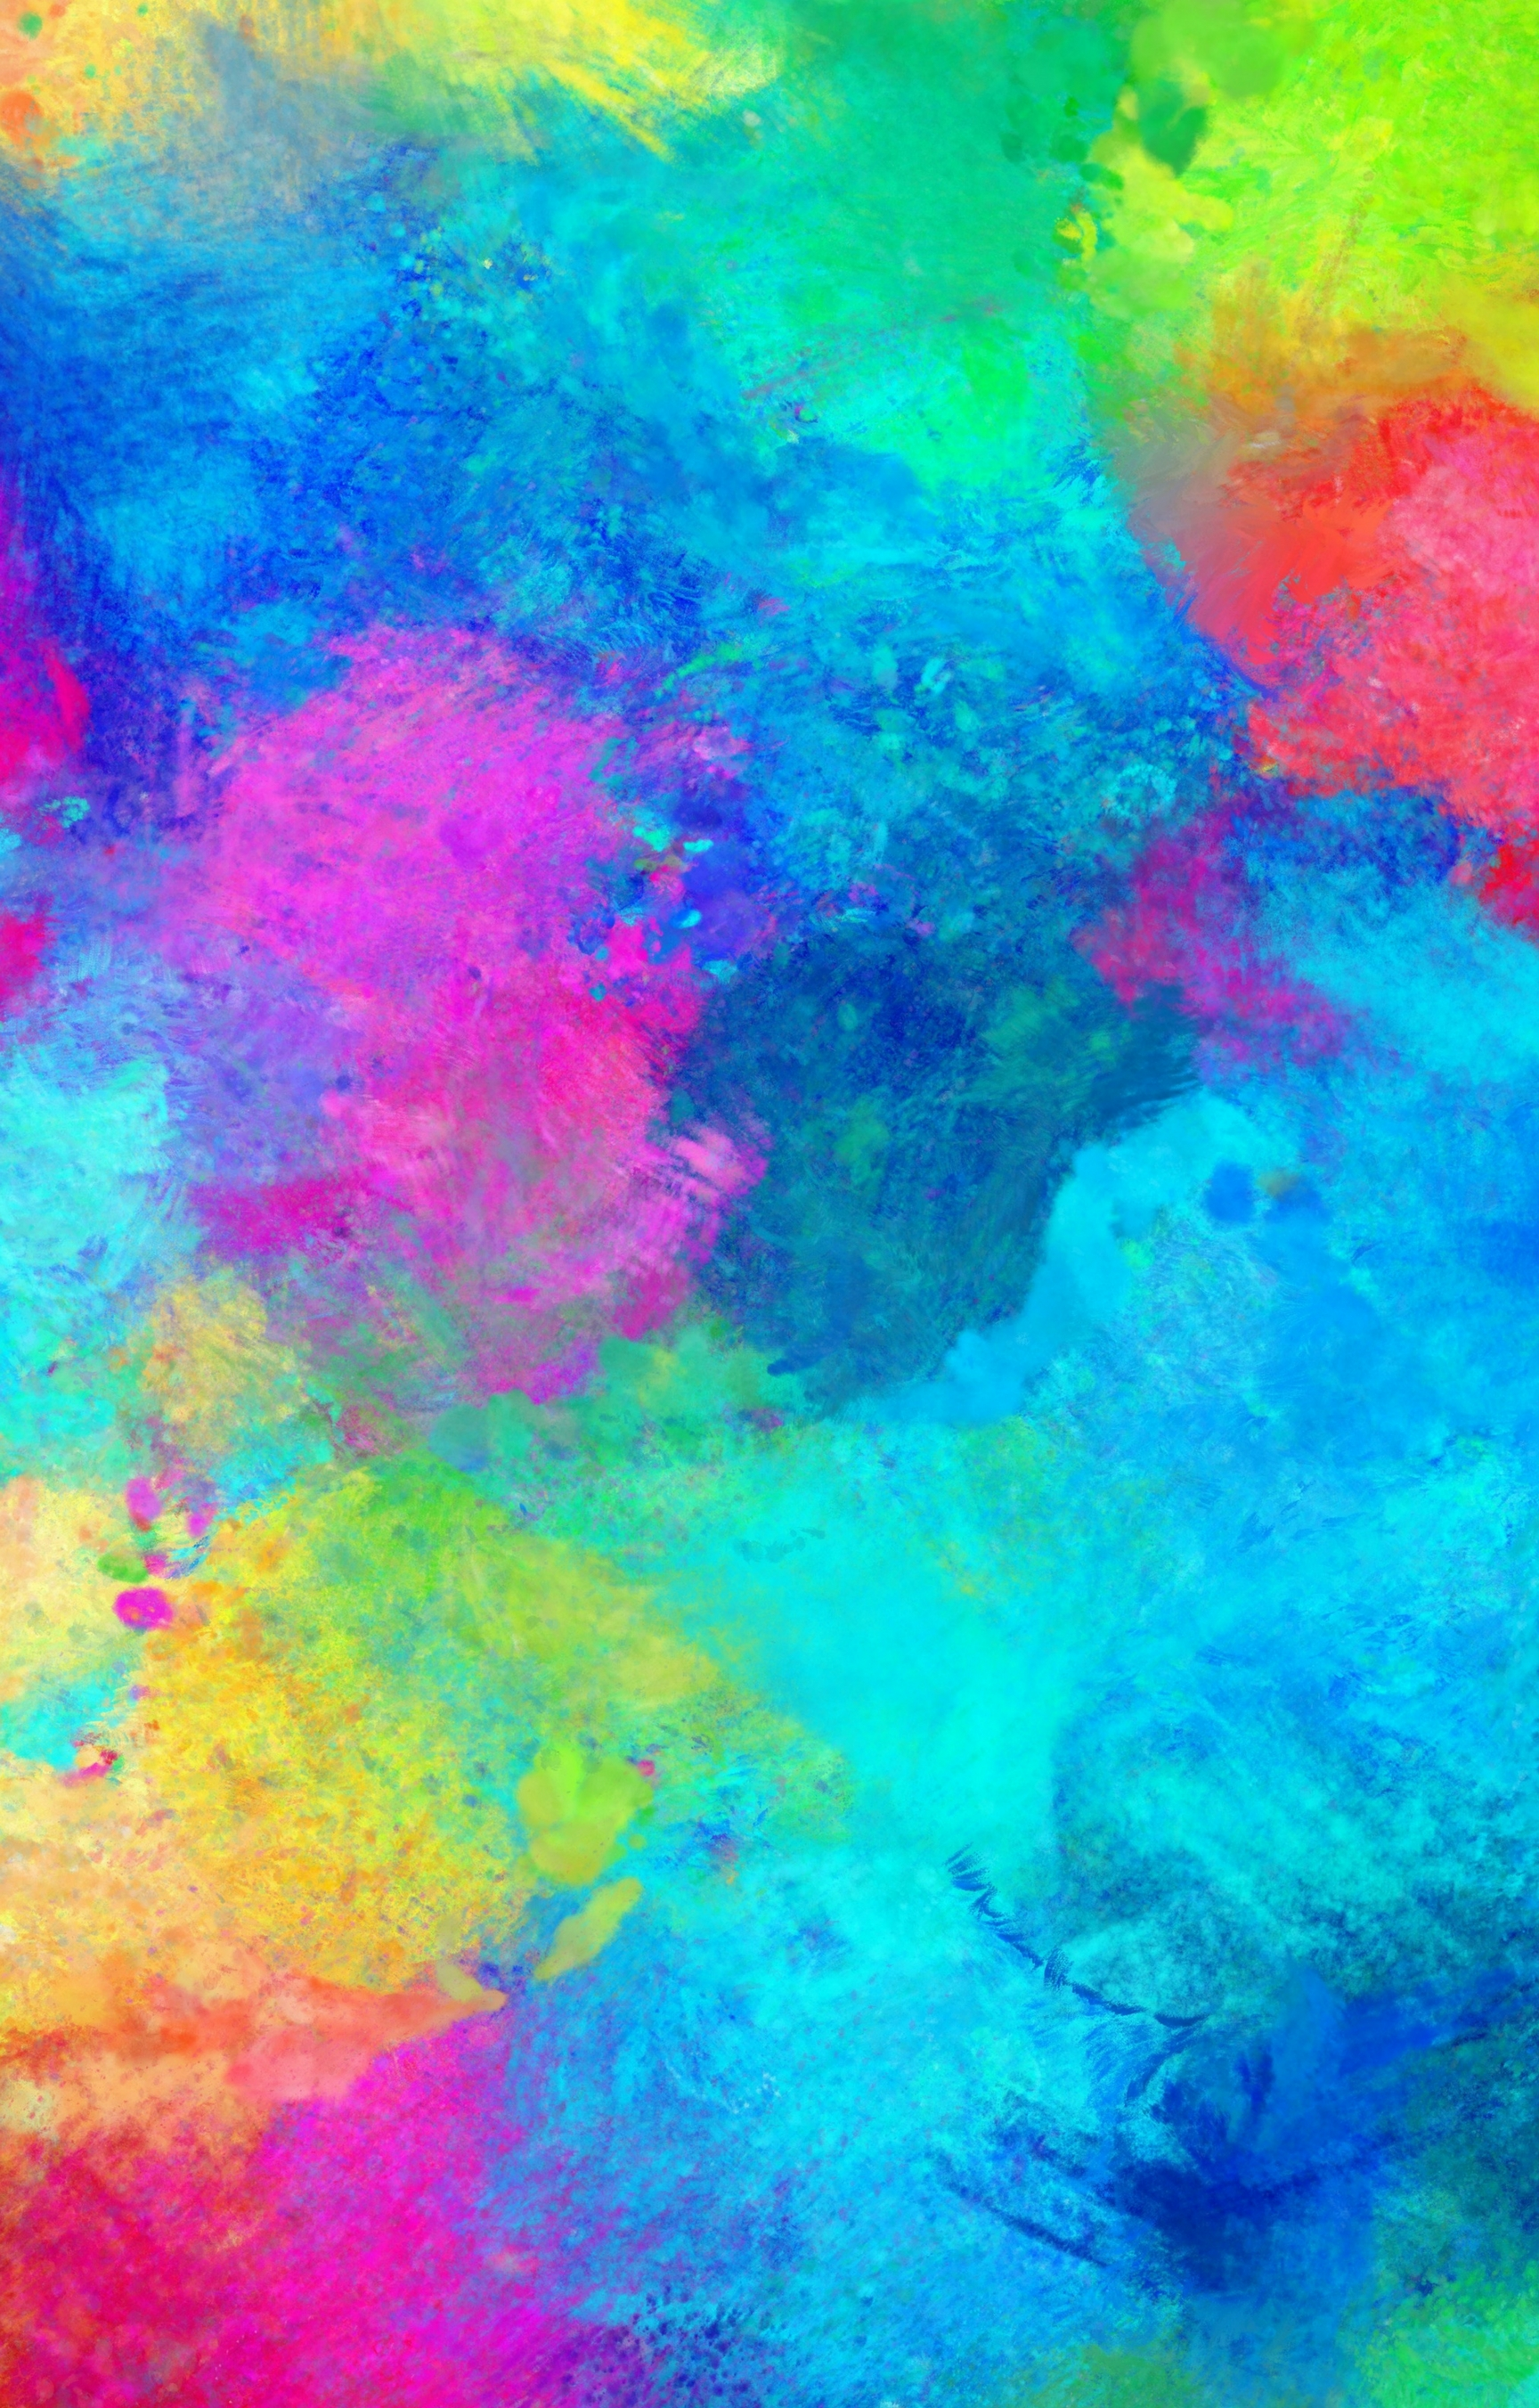 Rainbow Paint Effect Journals Red Panda Publishing